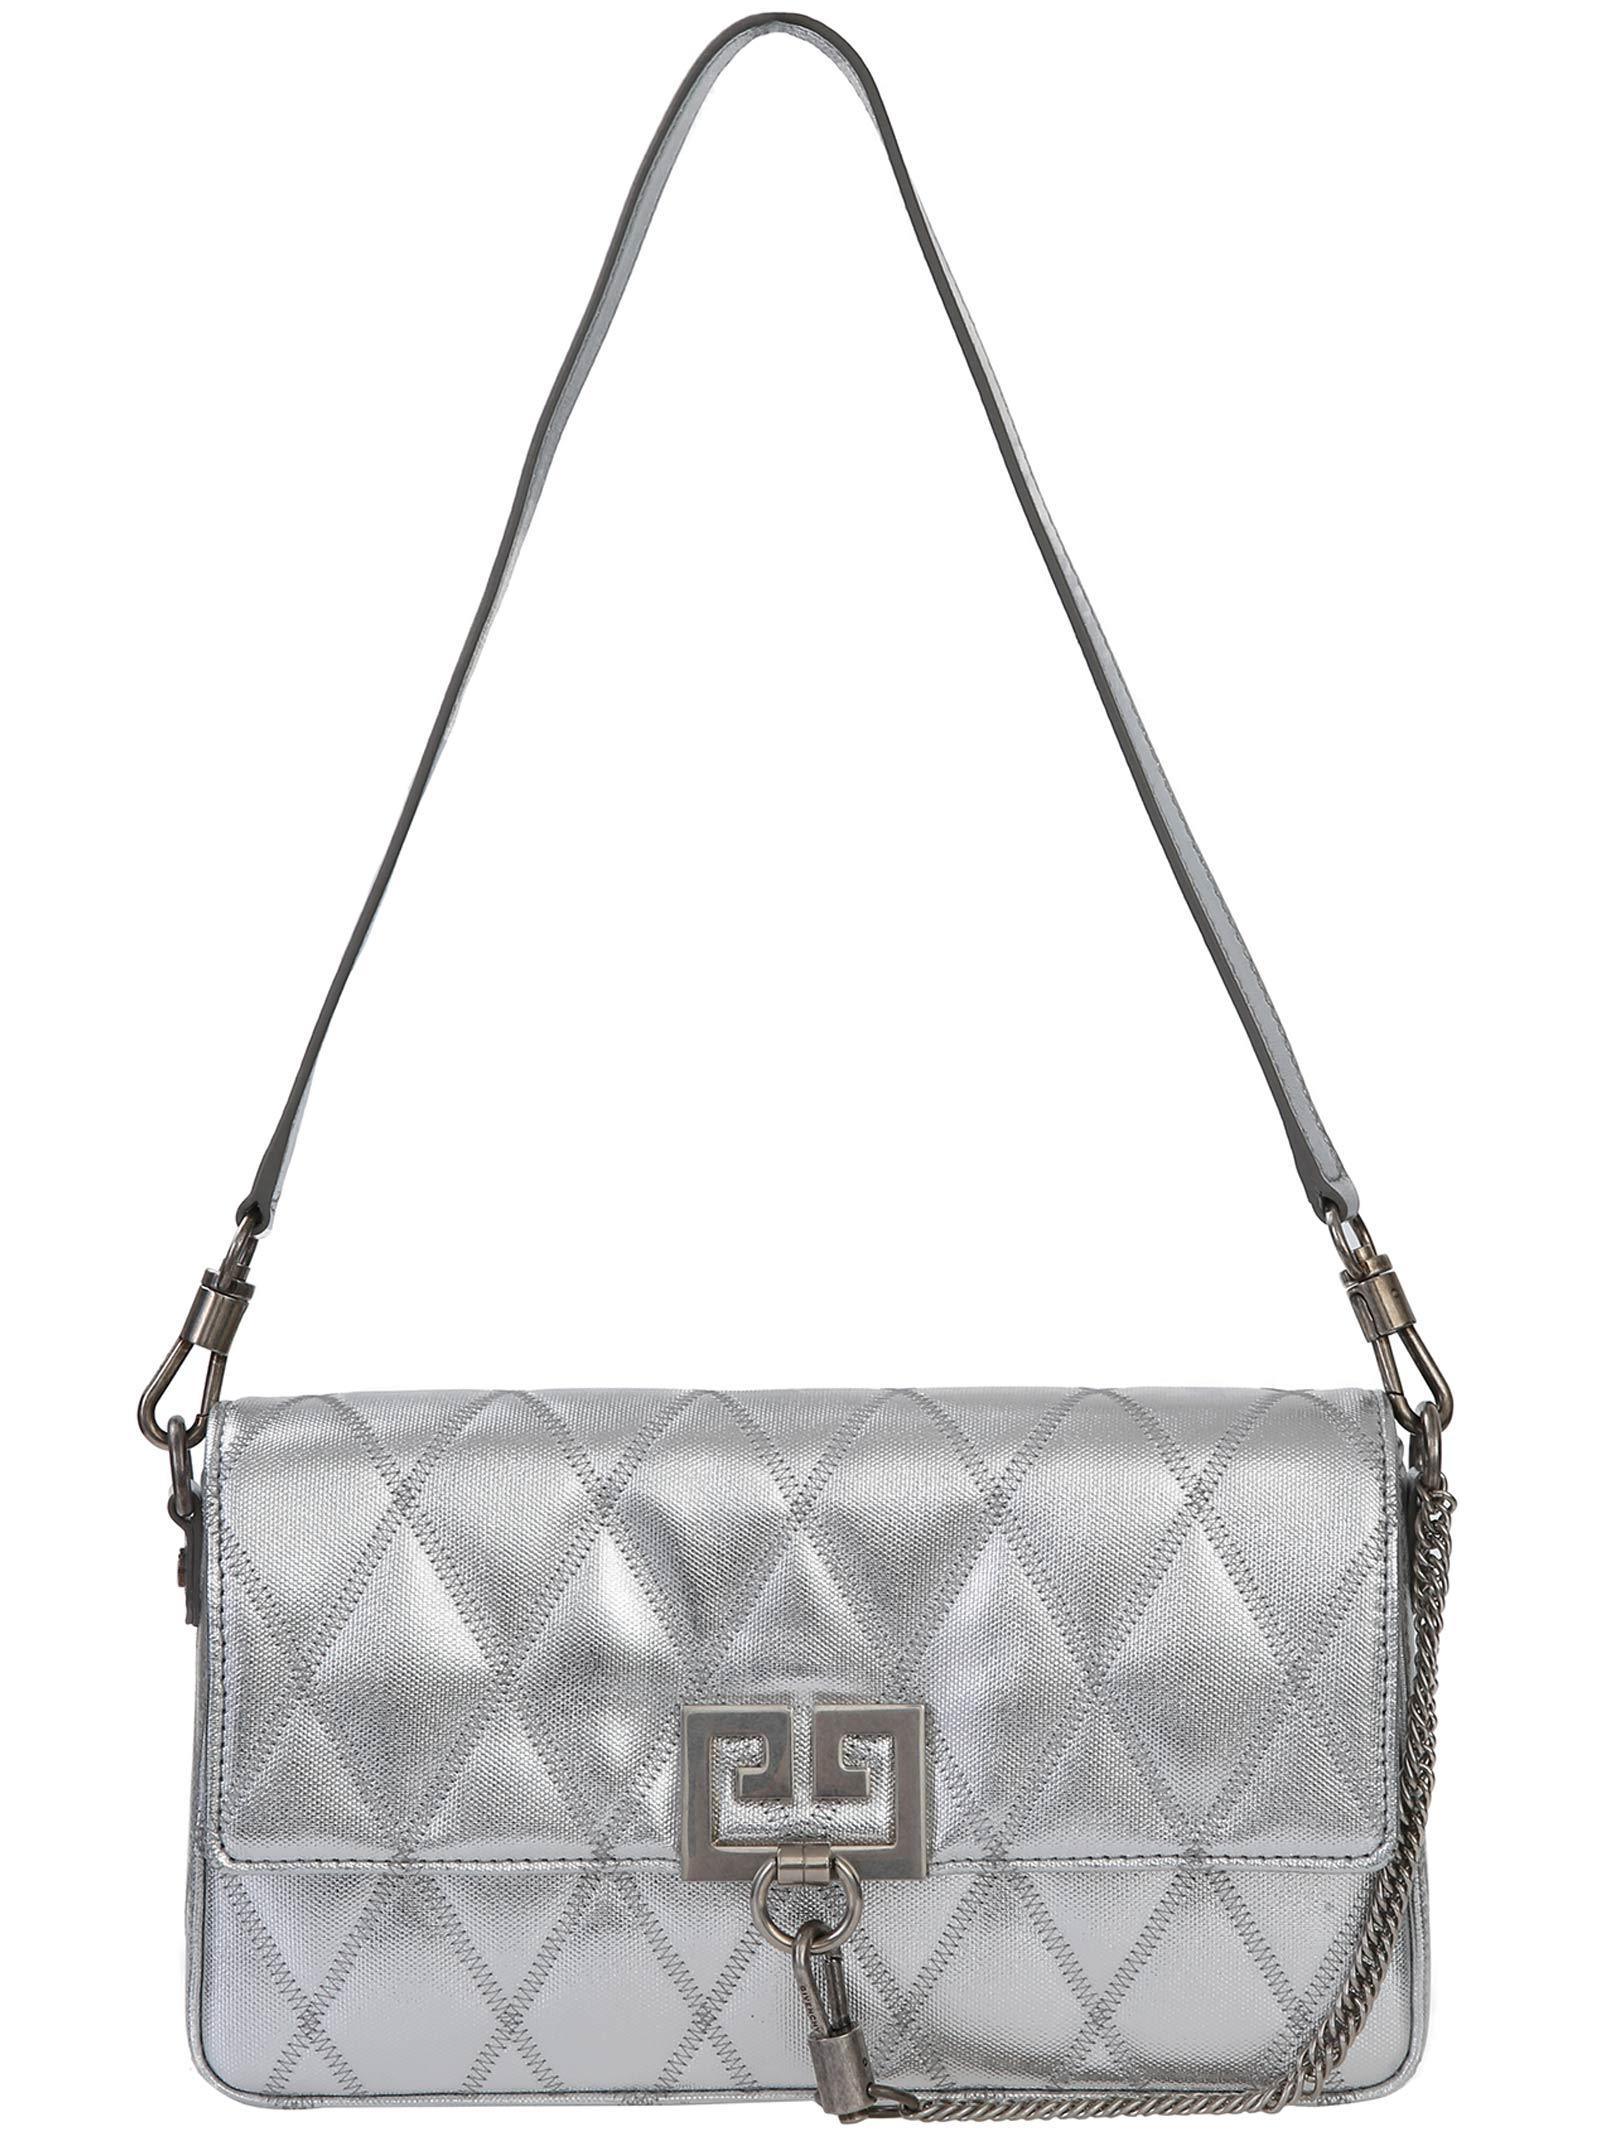 64973eacdebf Givenchy Givenchy Shoulder Bag - Silver - 10928489